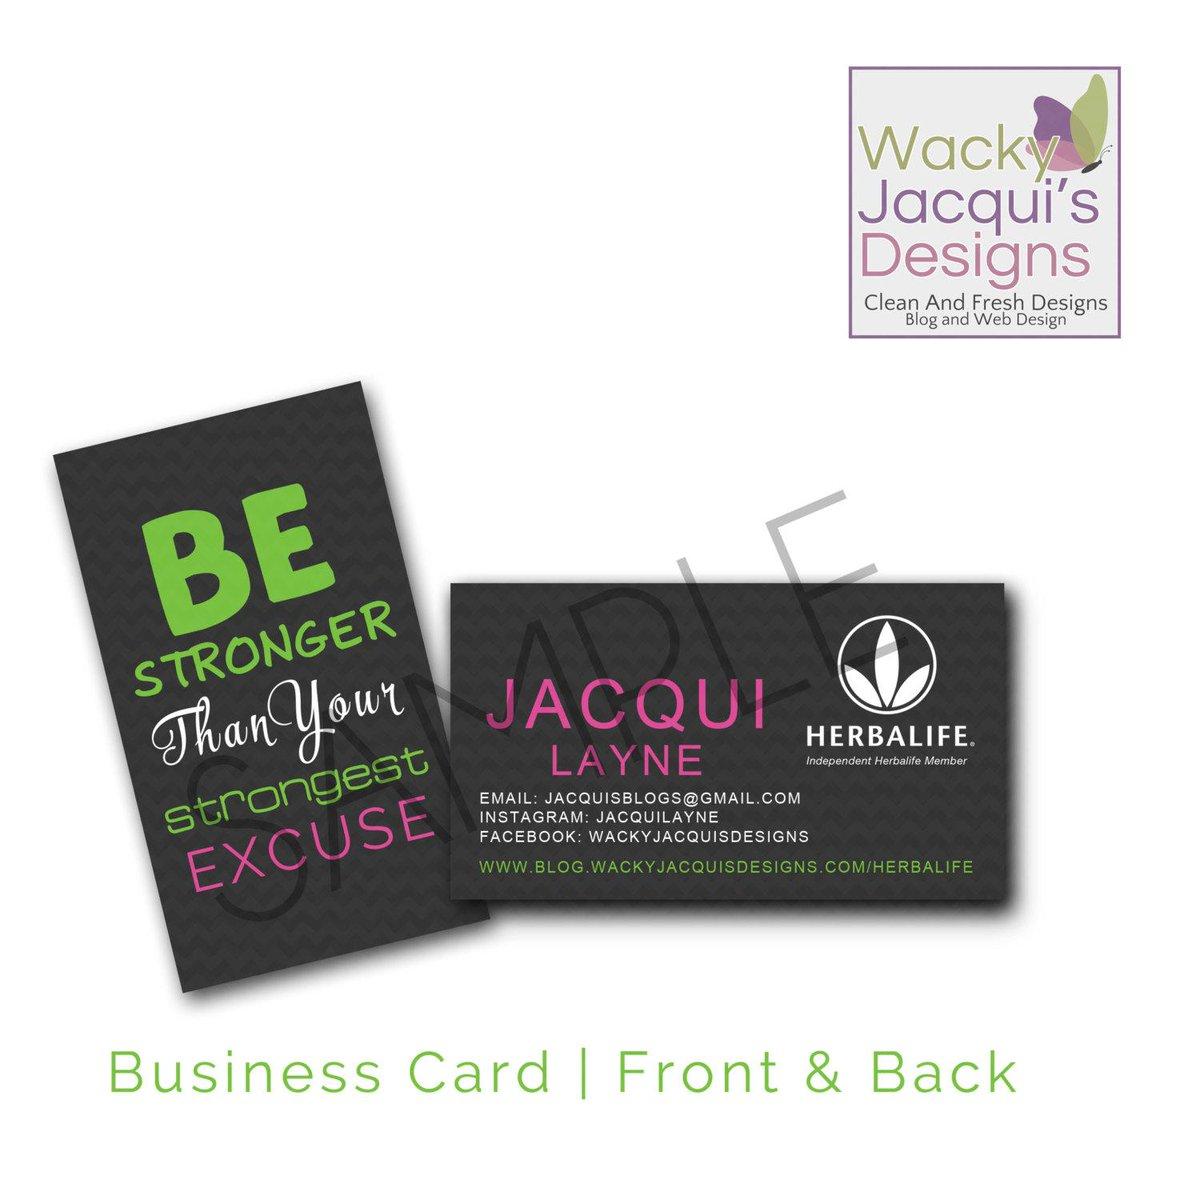 Jacqui layne on twitter herbalife business cards 1 herbalife jacqui layne on twitter herbalife business cards 1 herbalife branding herbalife branding herb httpto6iwuziseo etsy herbalife colourmoves